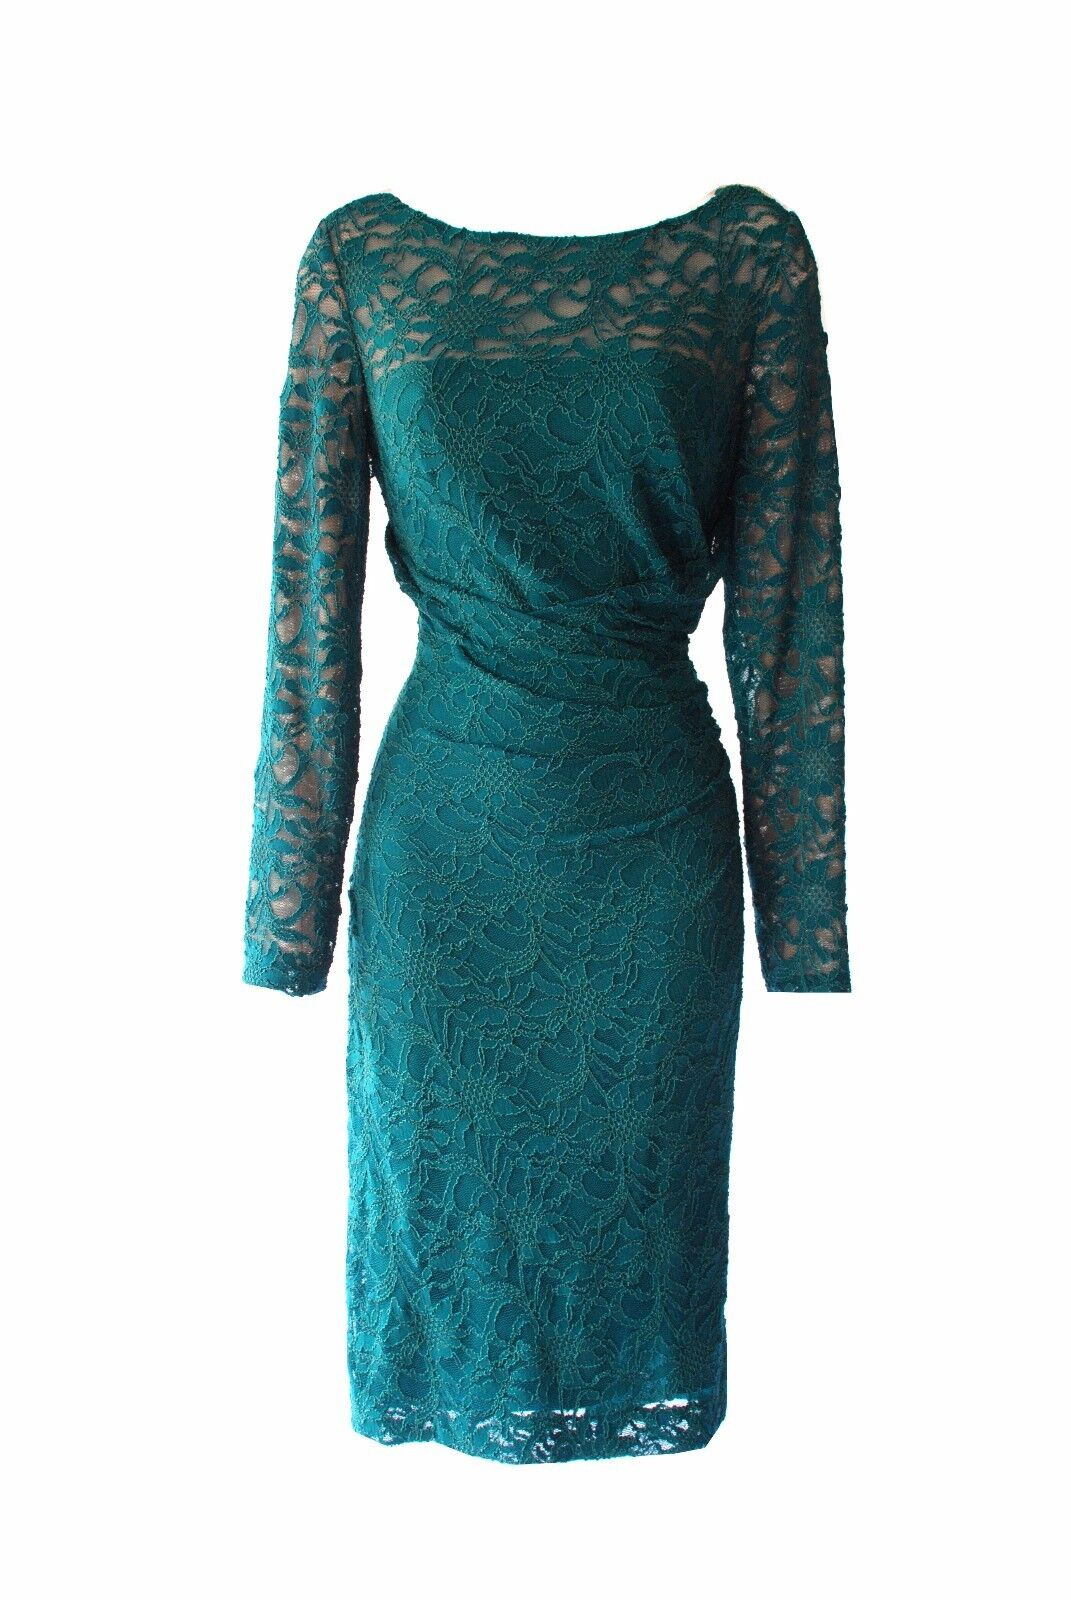 Ralph Lauren Lace Long Sleeves Stretch Elegant Party Occasion Dress Grün 6